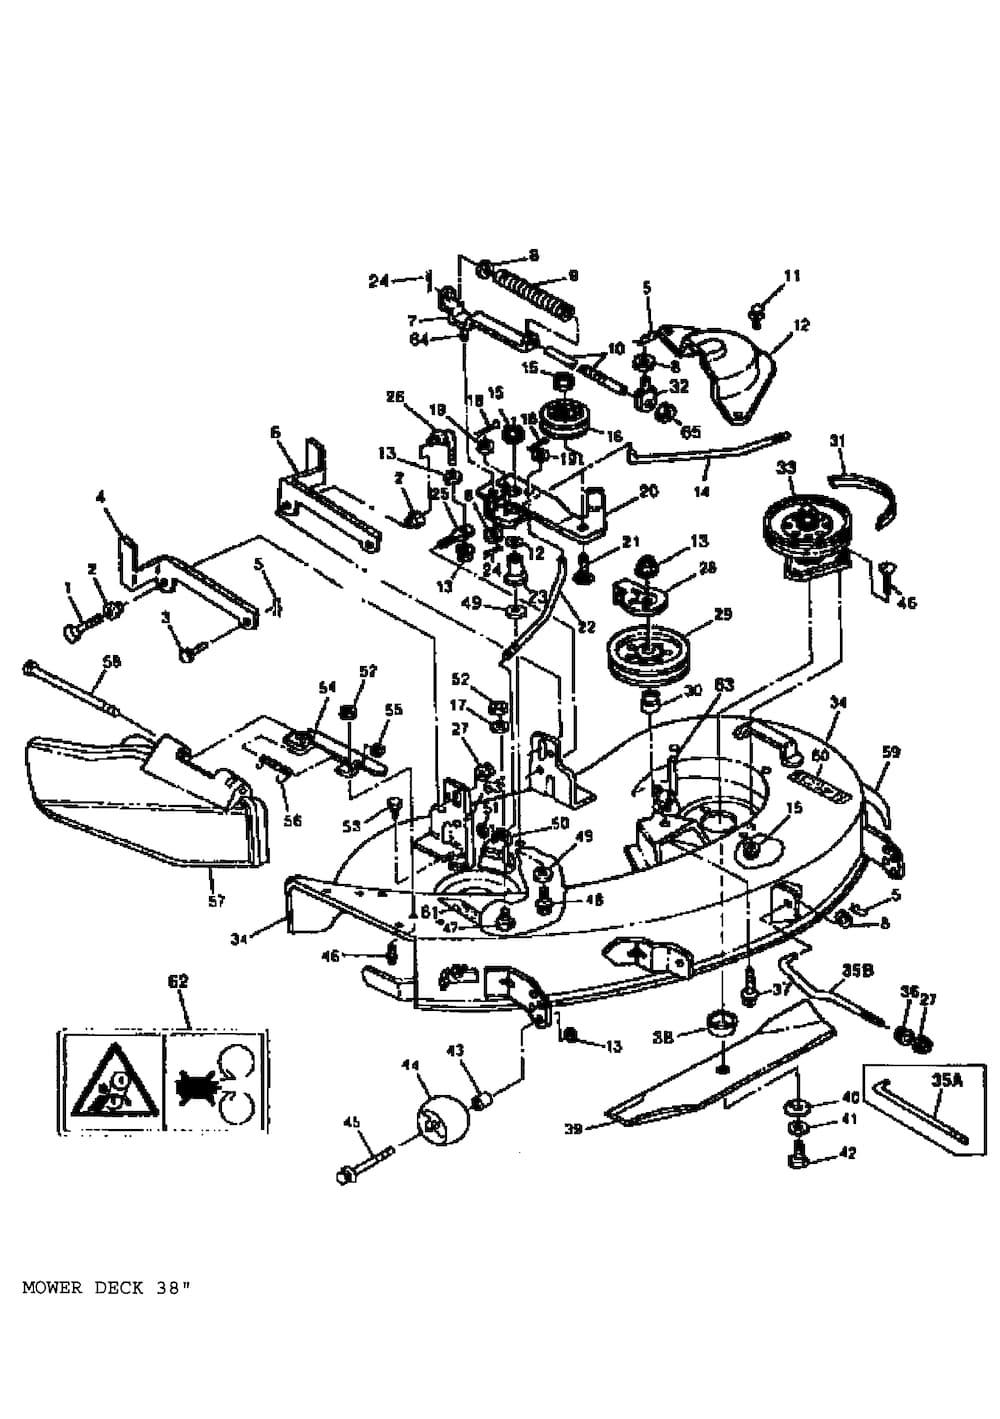 John Deere Riding Mower Parts Belt Idler Arm Hitch Diagram And List For Snapper Ridingmower Ebay